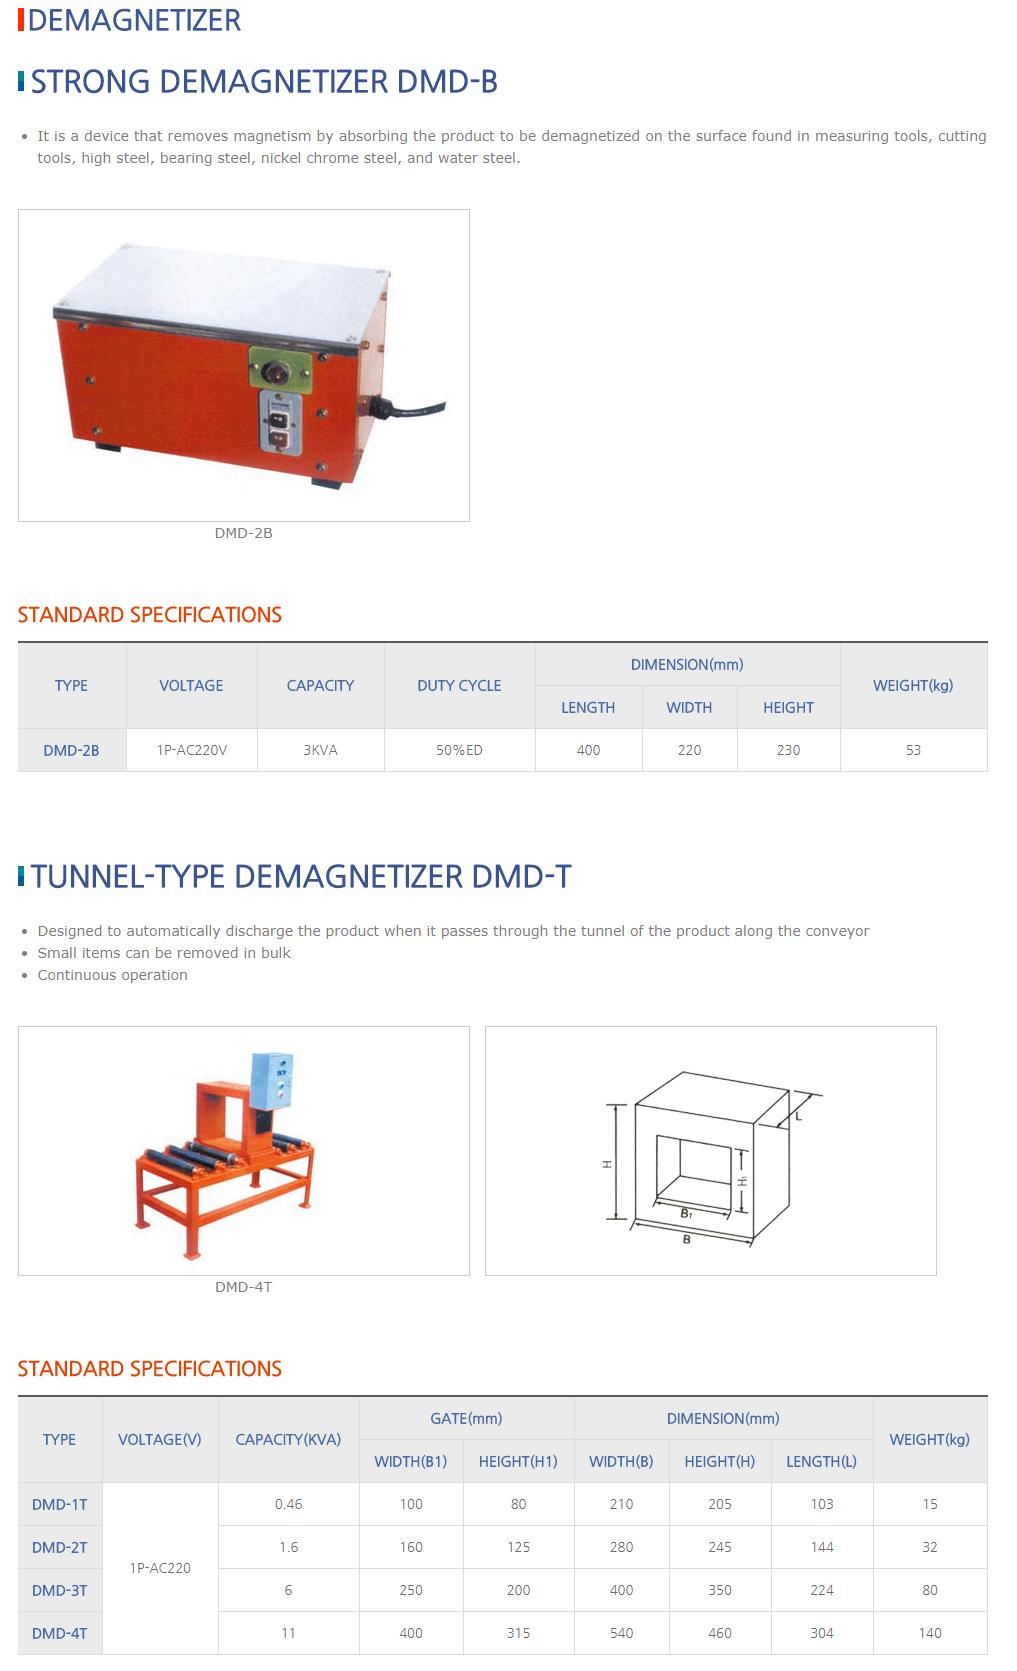 DAESUNG MARGNET Demagnetizer DMD-B/DMD-T Type